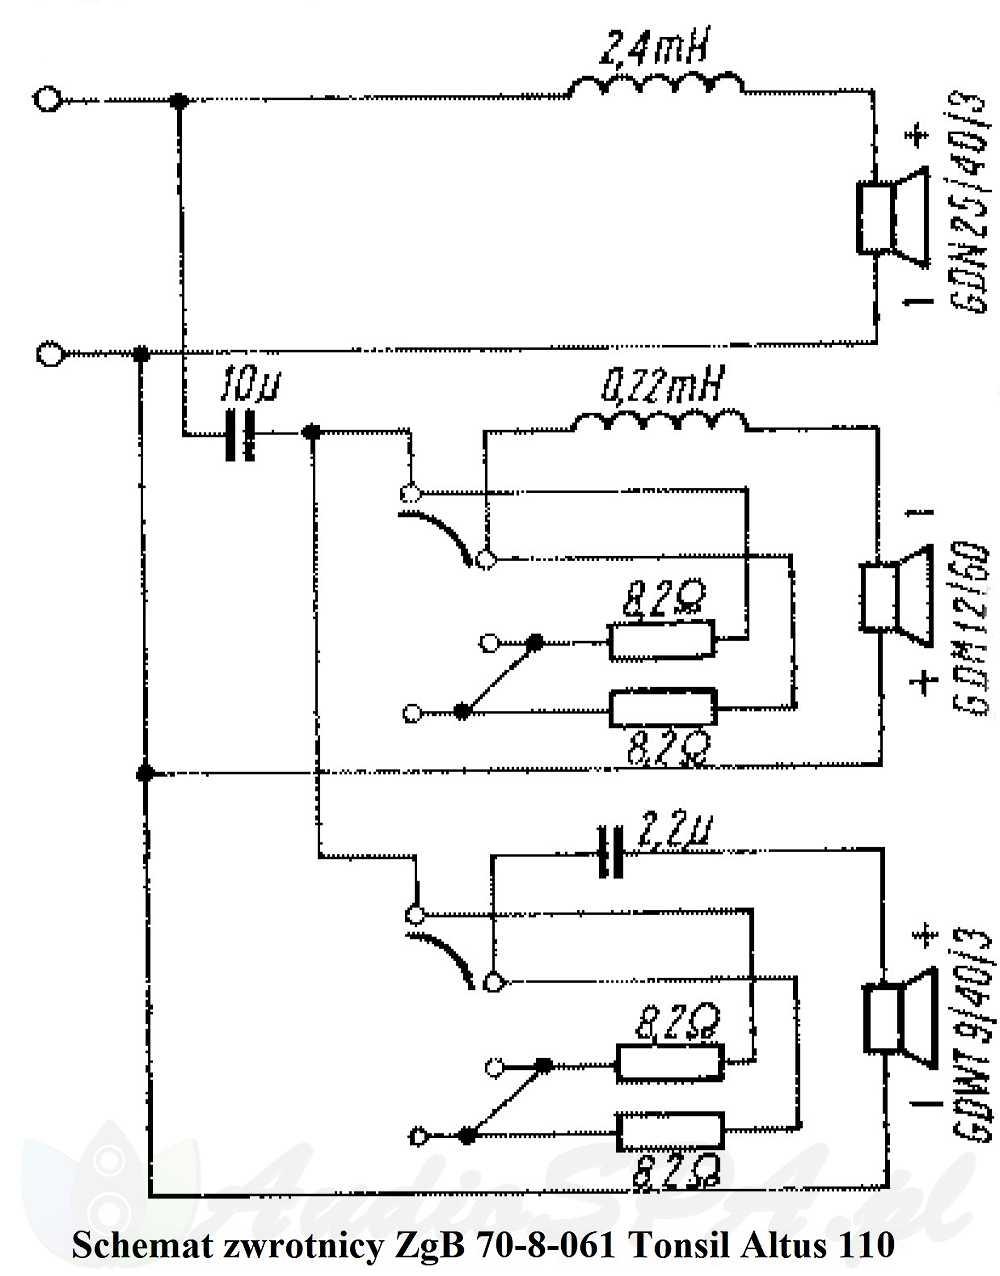 Schemat zwrotnicy ZgB 70-8-061 Tonsil Altus 110